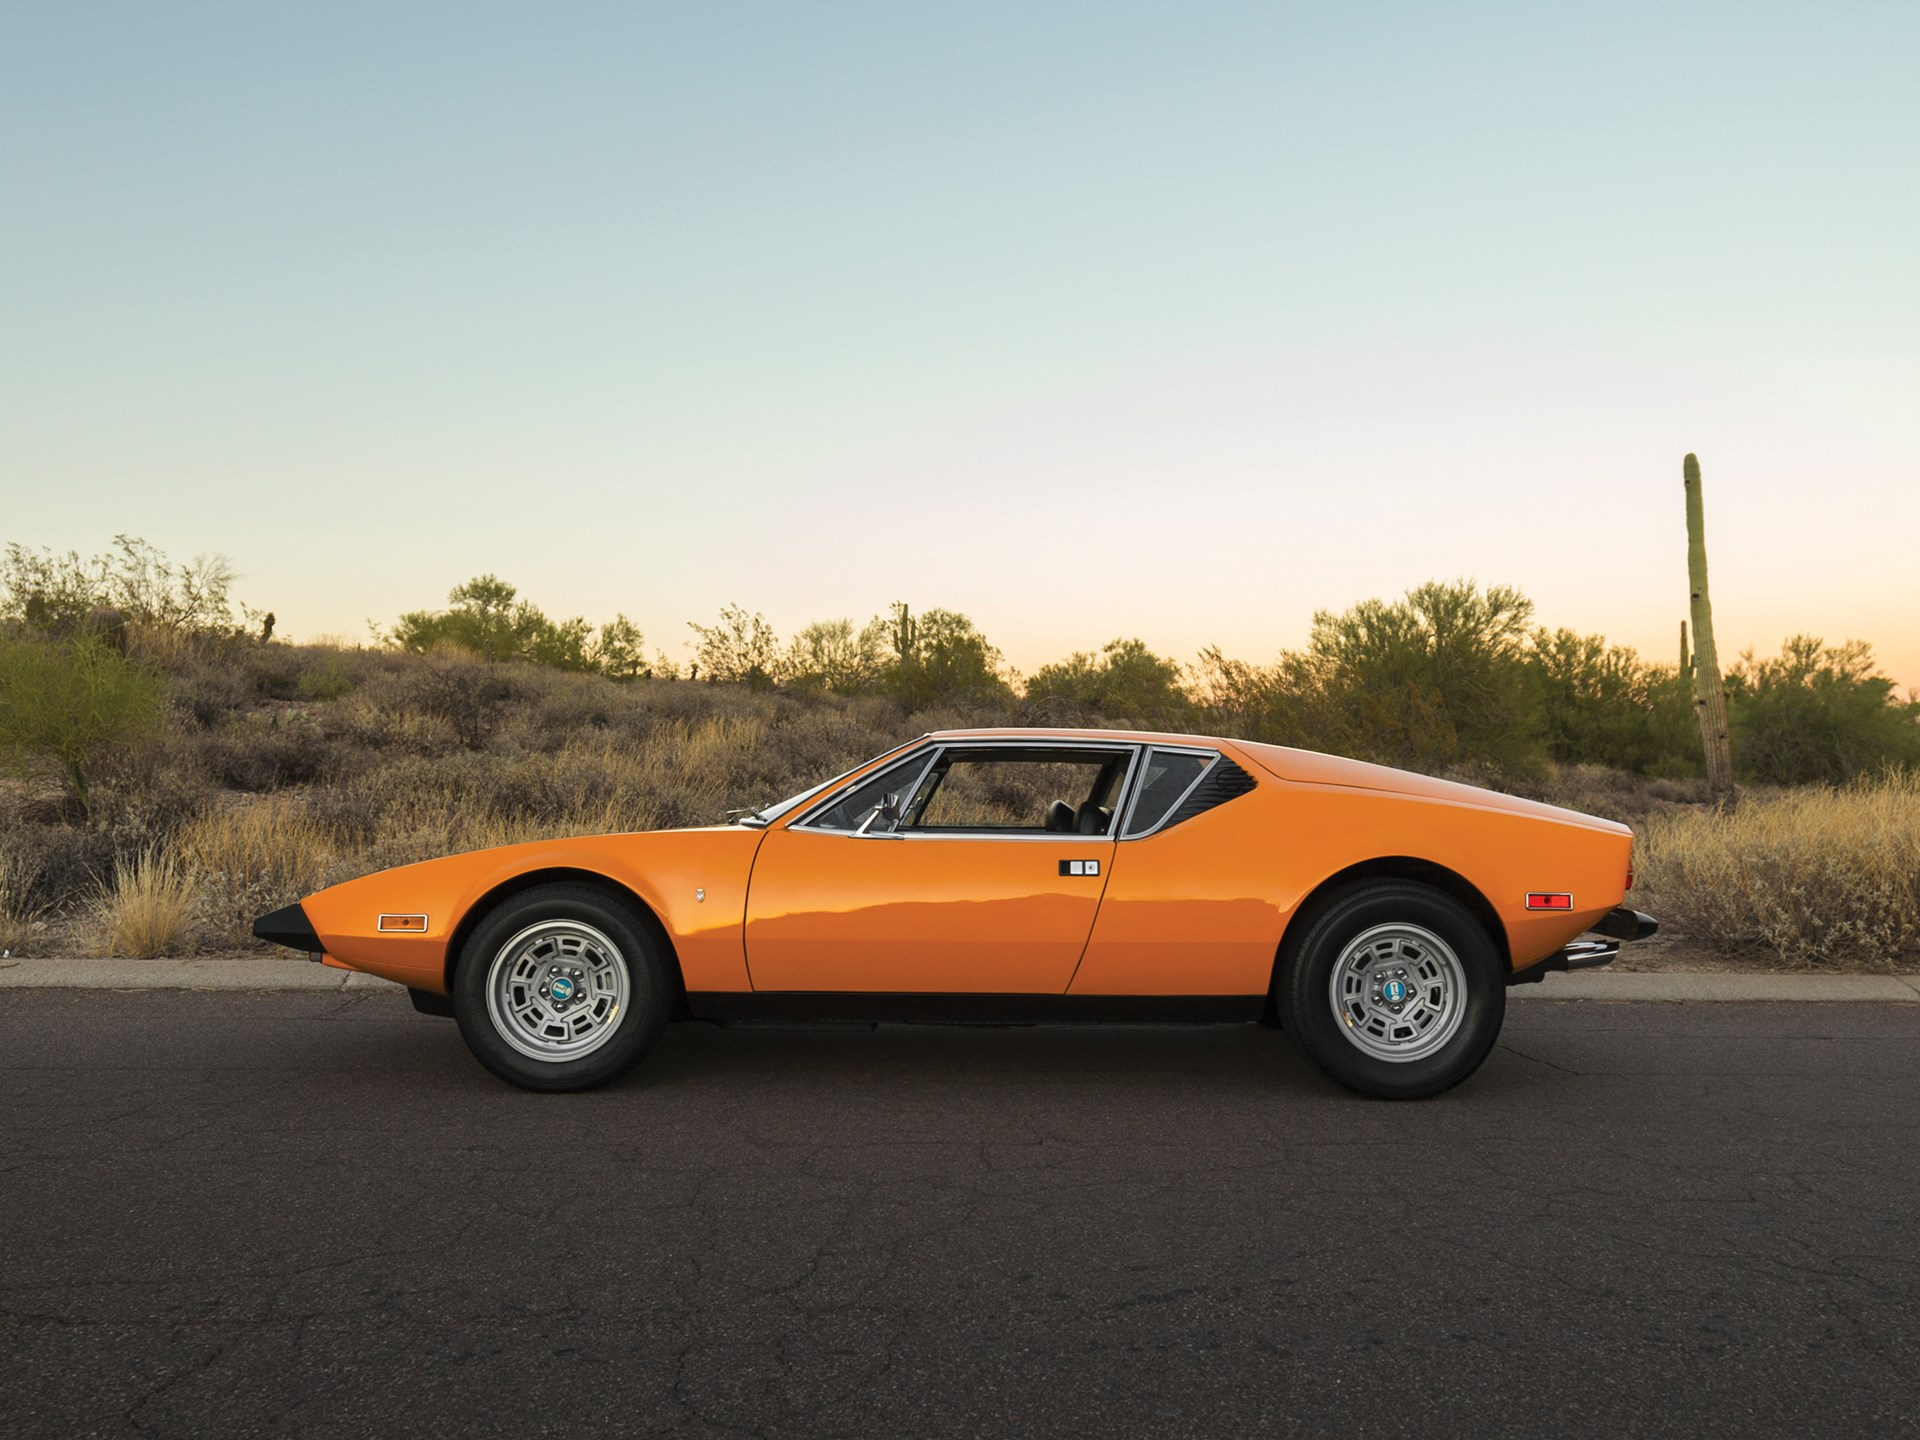 1973 De Tomaso Pantera profile